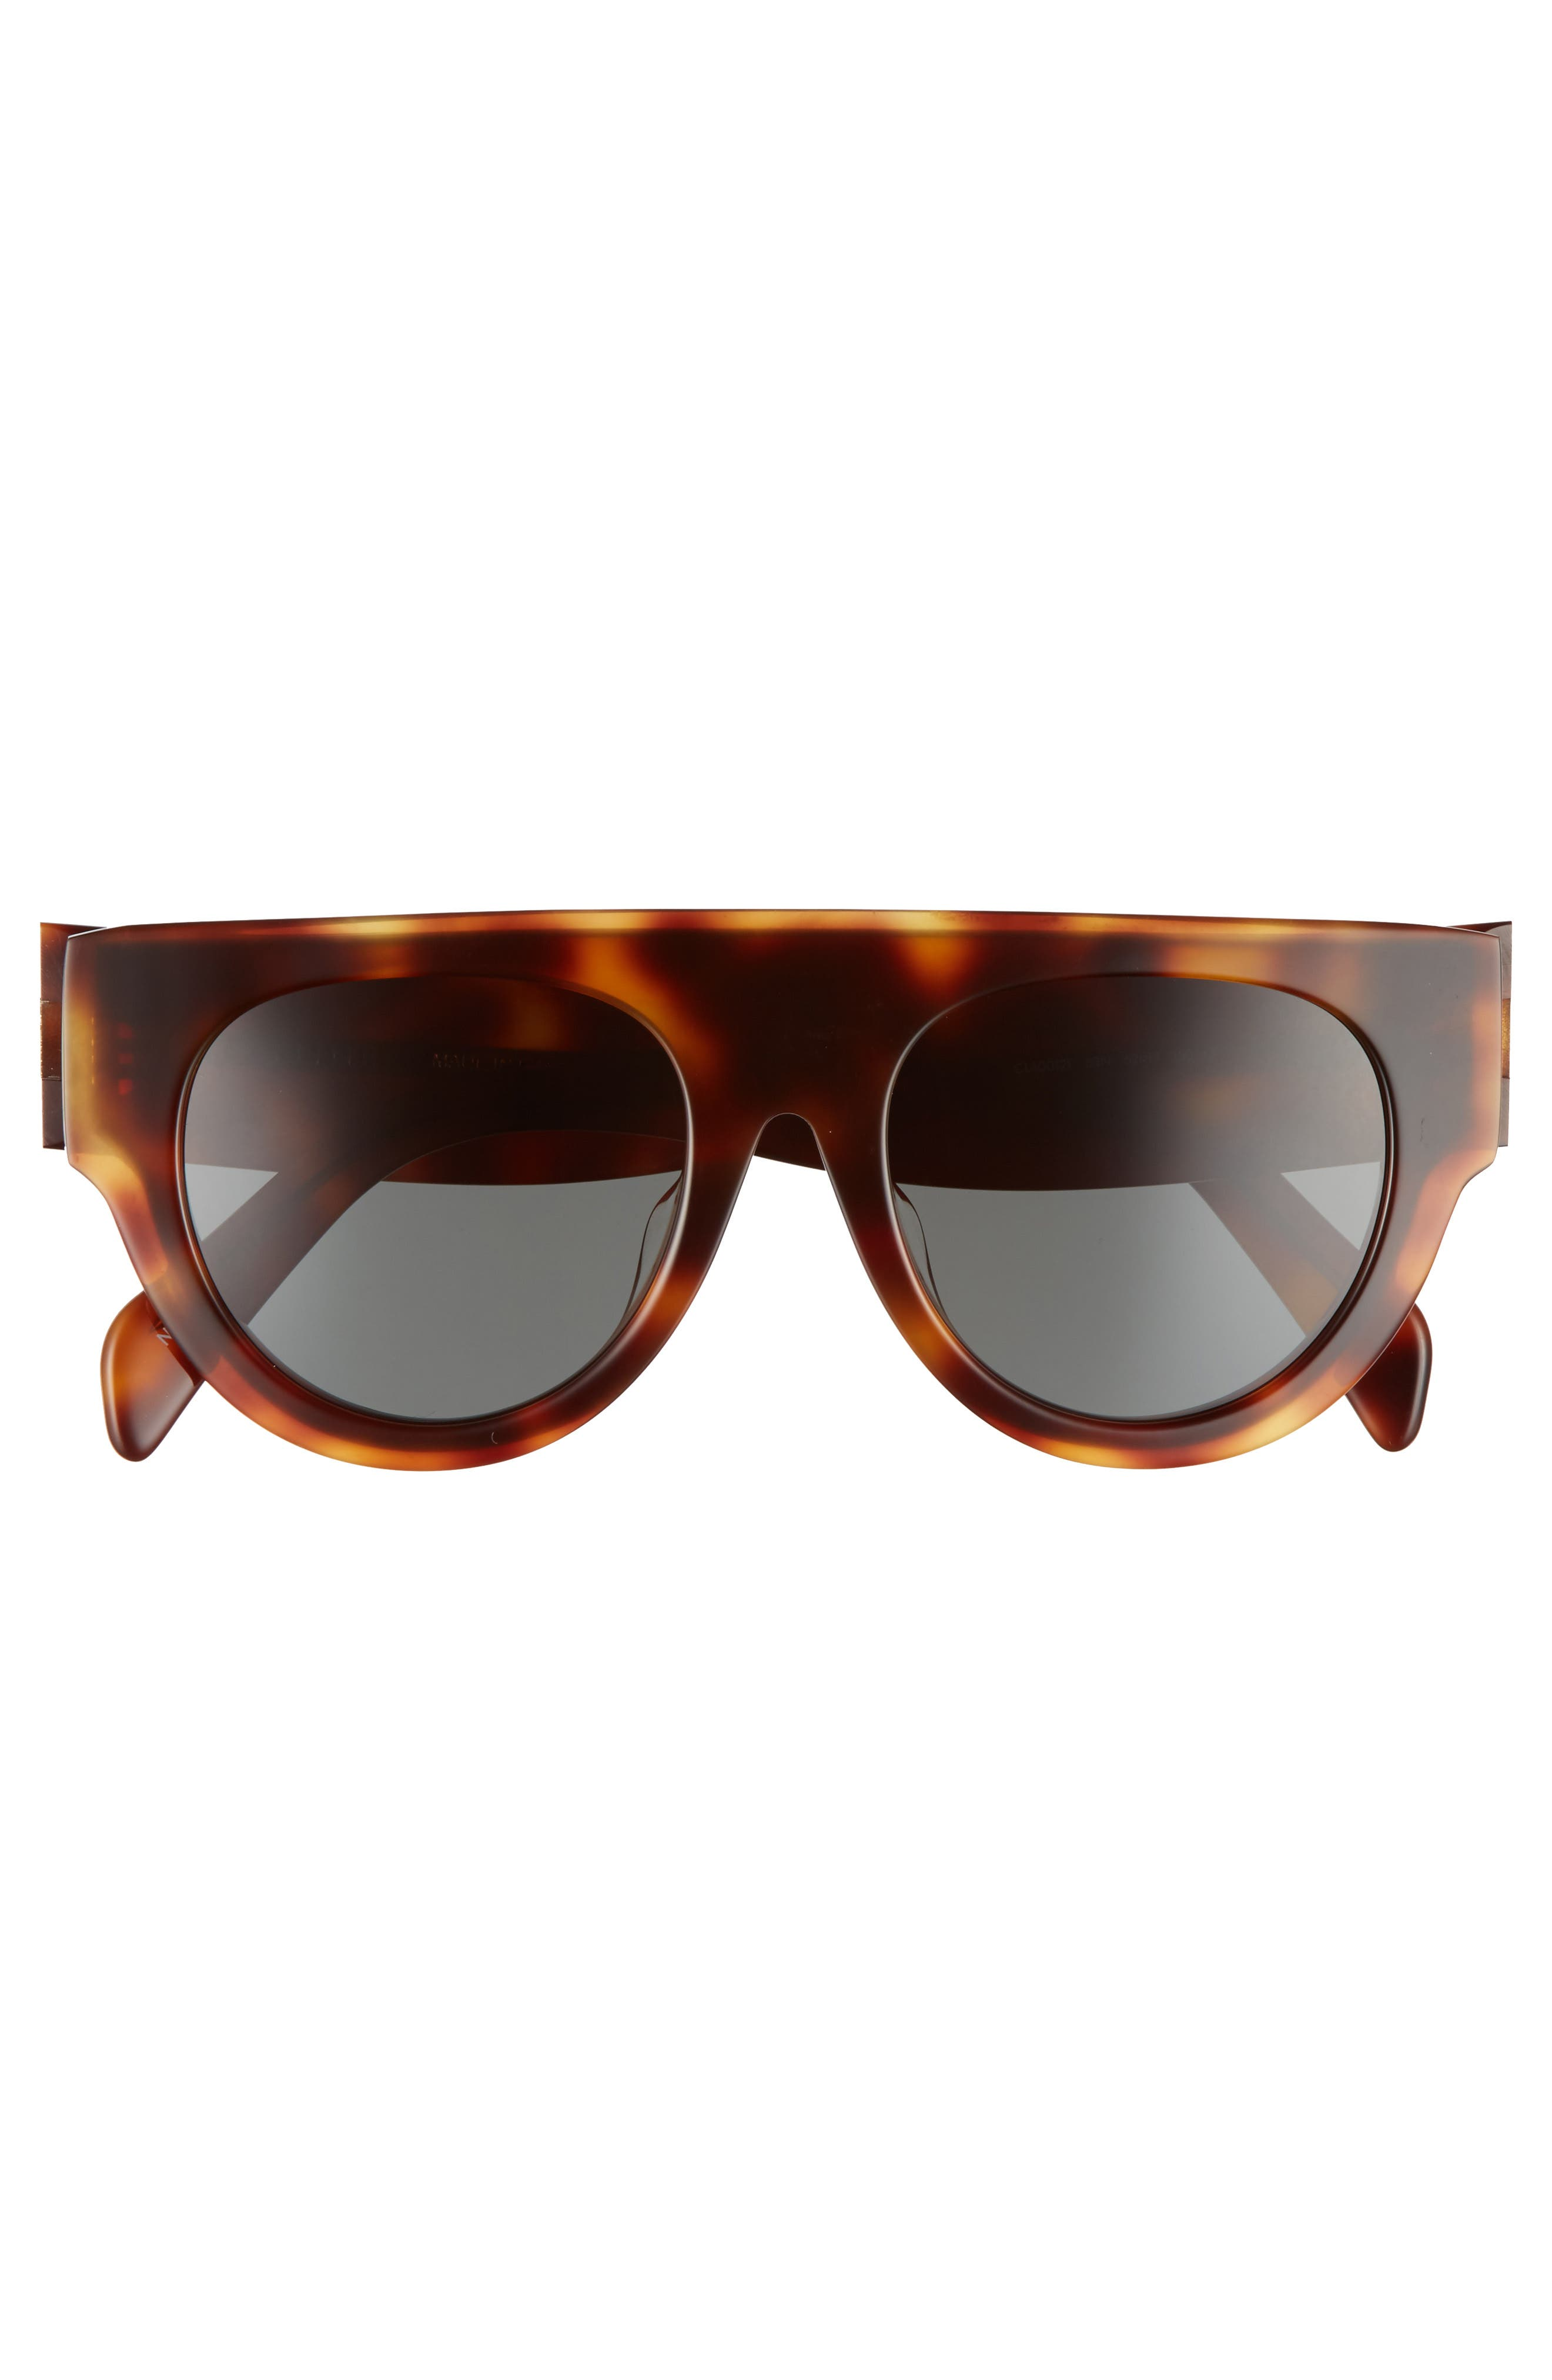 52mm Pilot Sunglasses,                             Alternate thumbnail 3, color,                             Blonde Havana/ Green